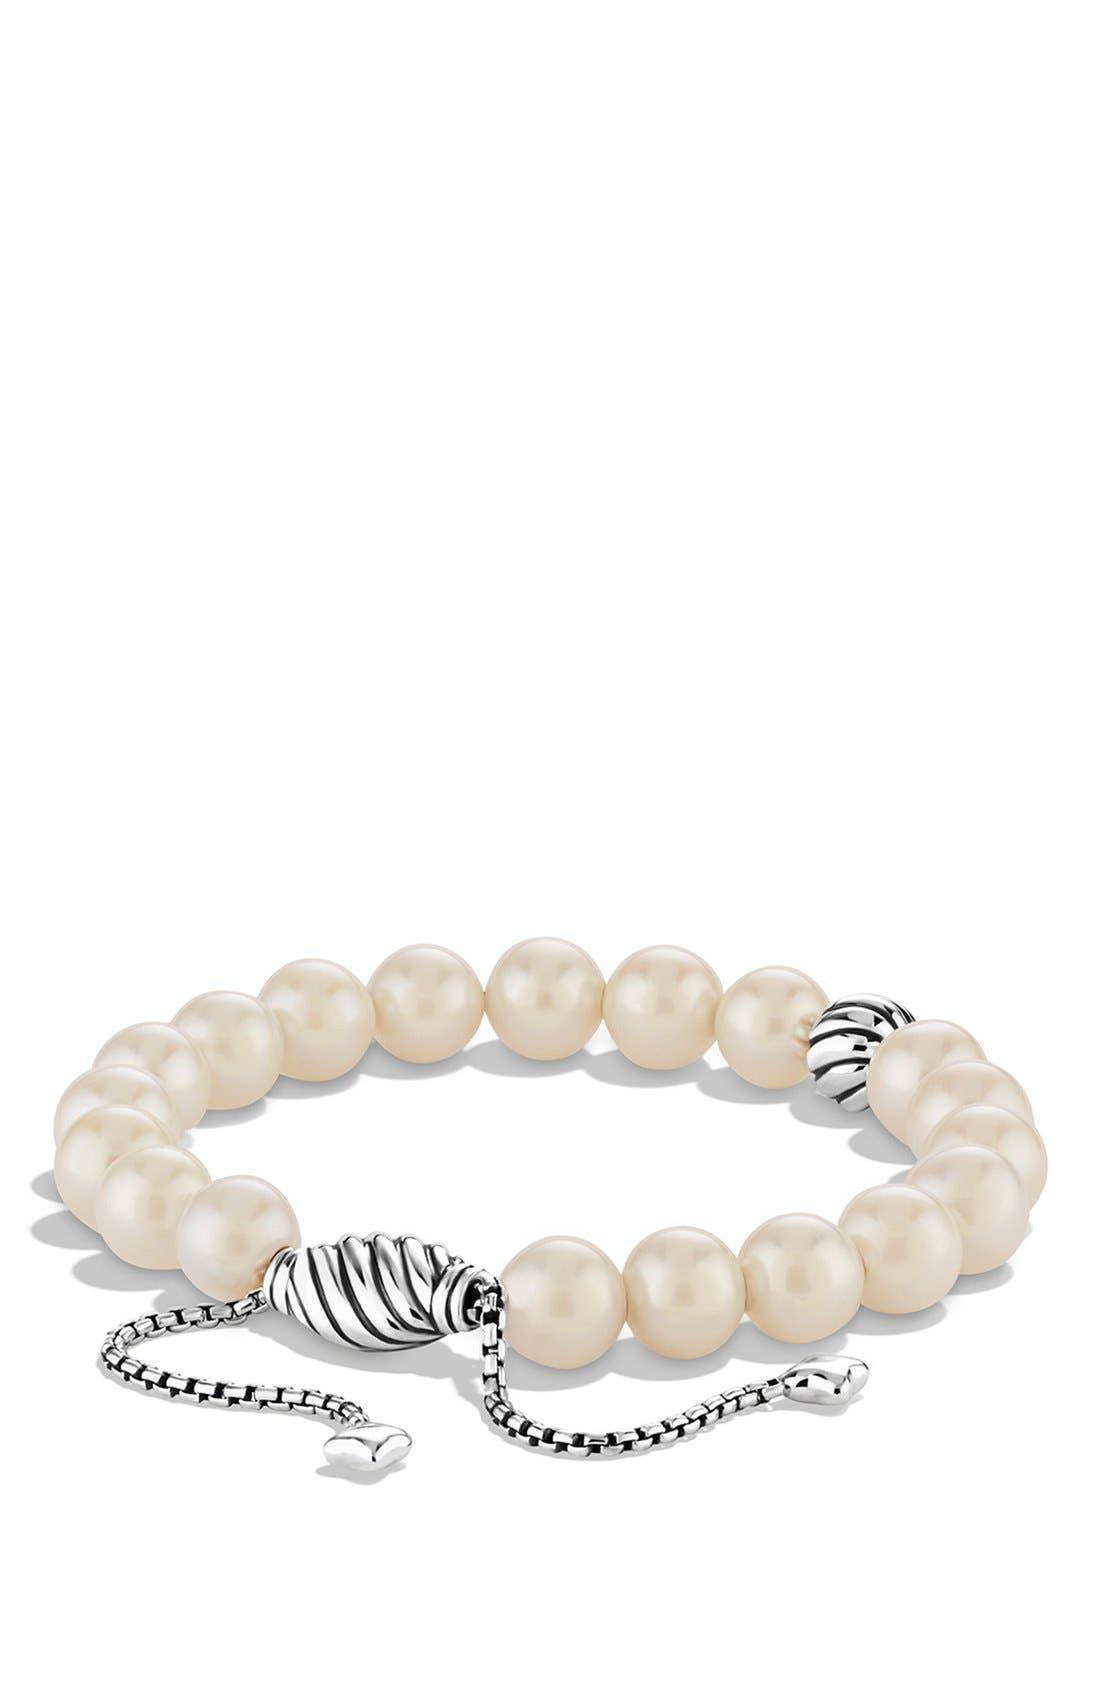 David Yurman 'Spiritual Beads' Bracelet with Pearls